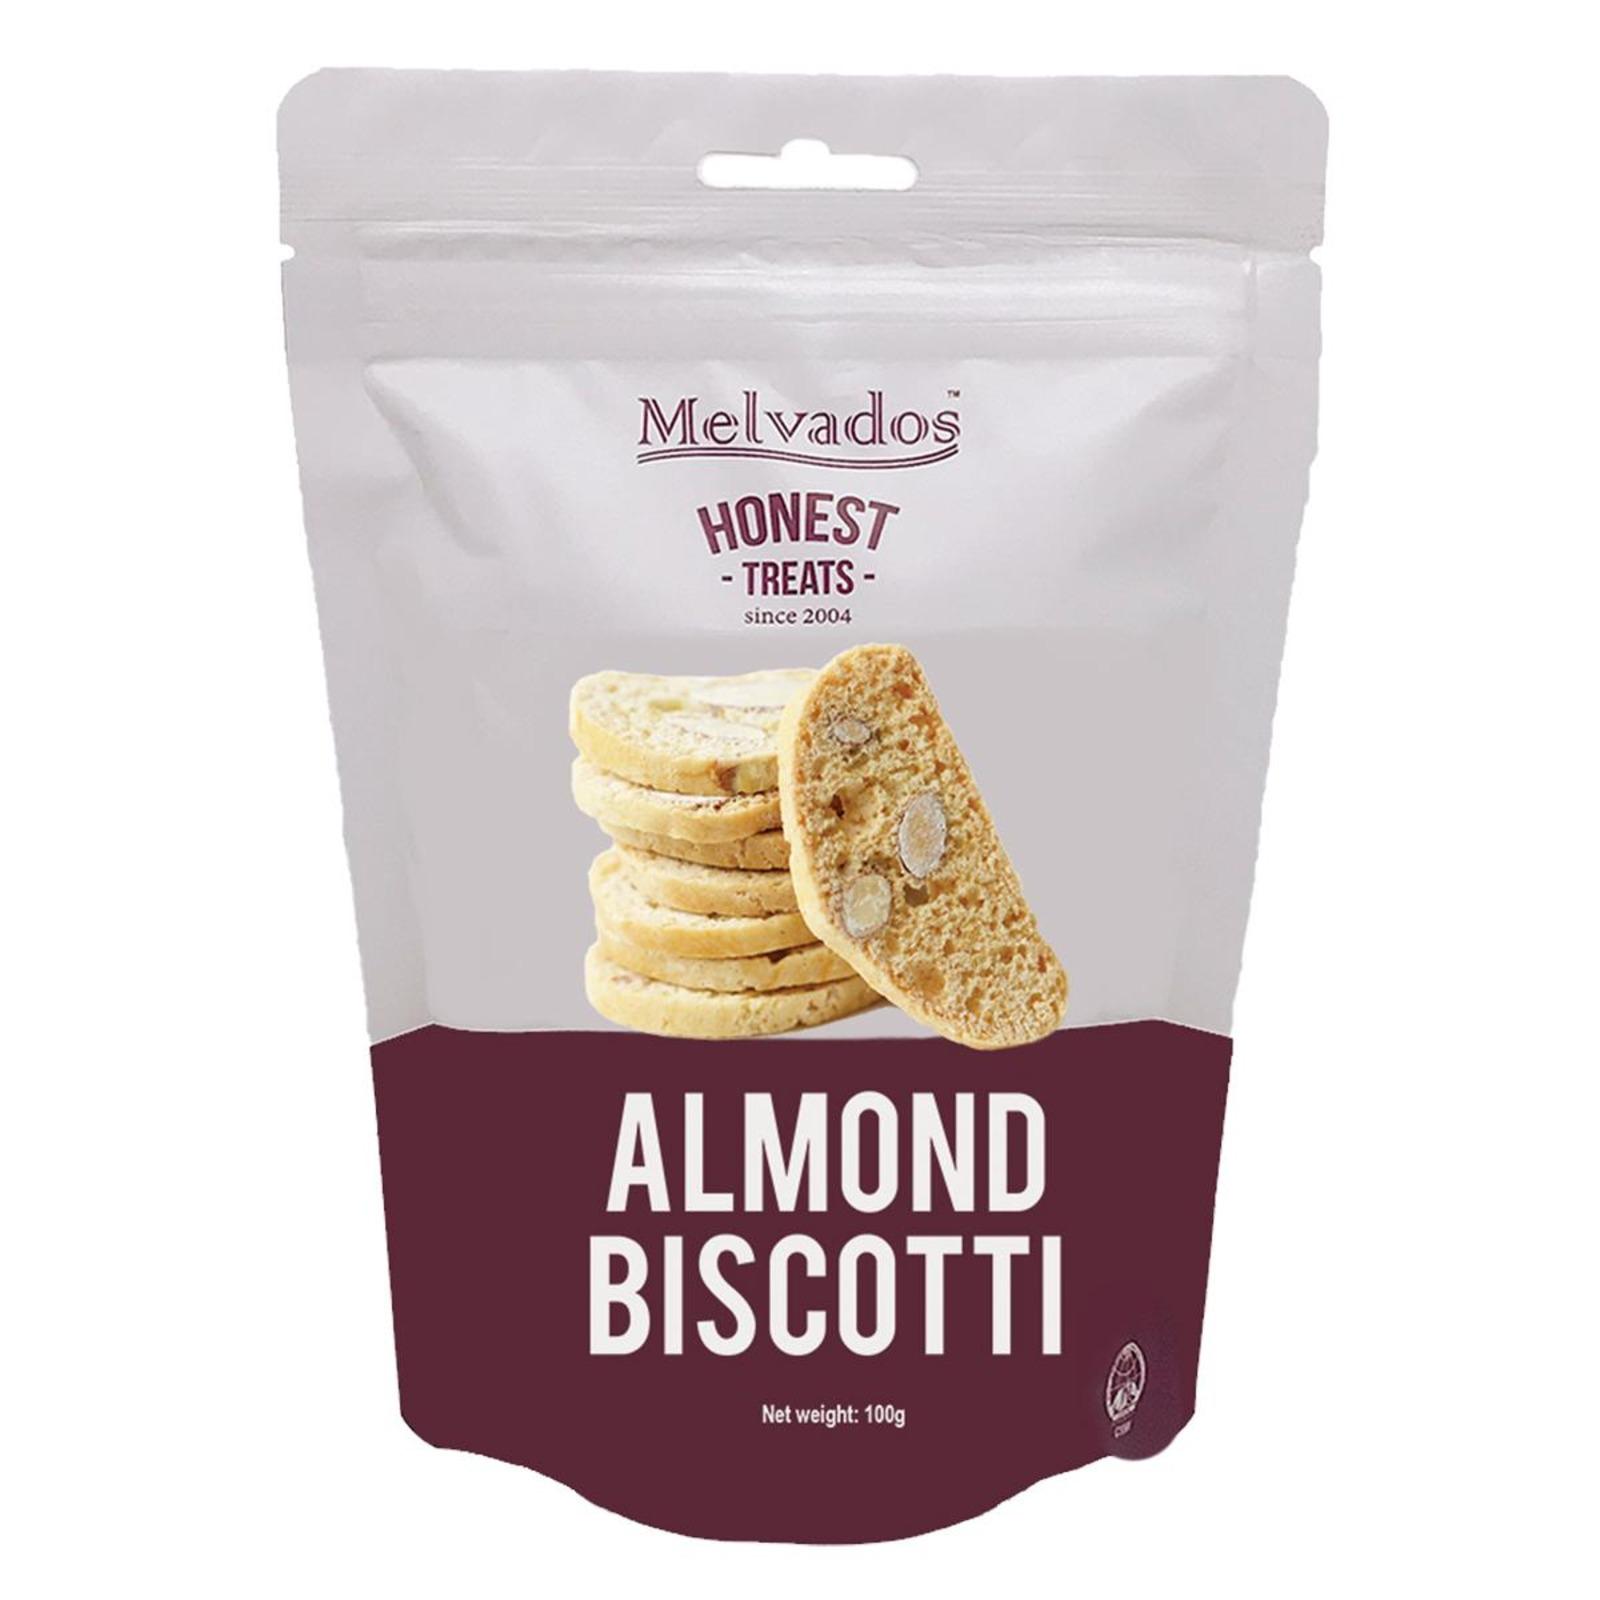 MELVADOS Almond Biscotti